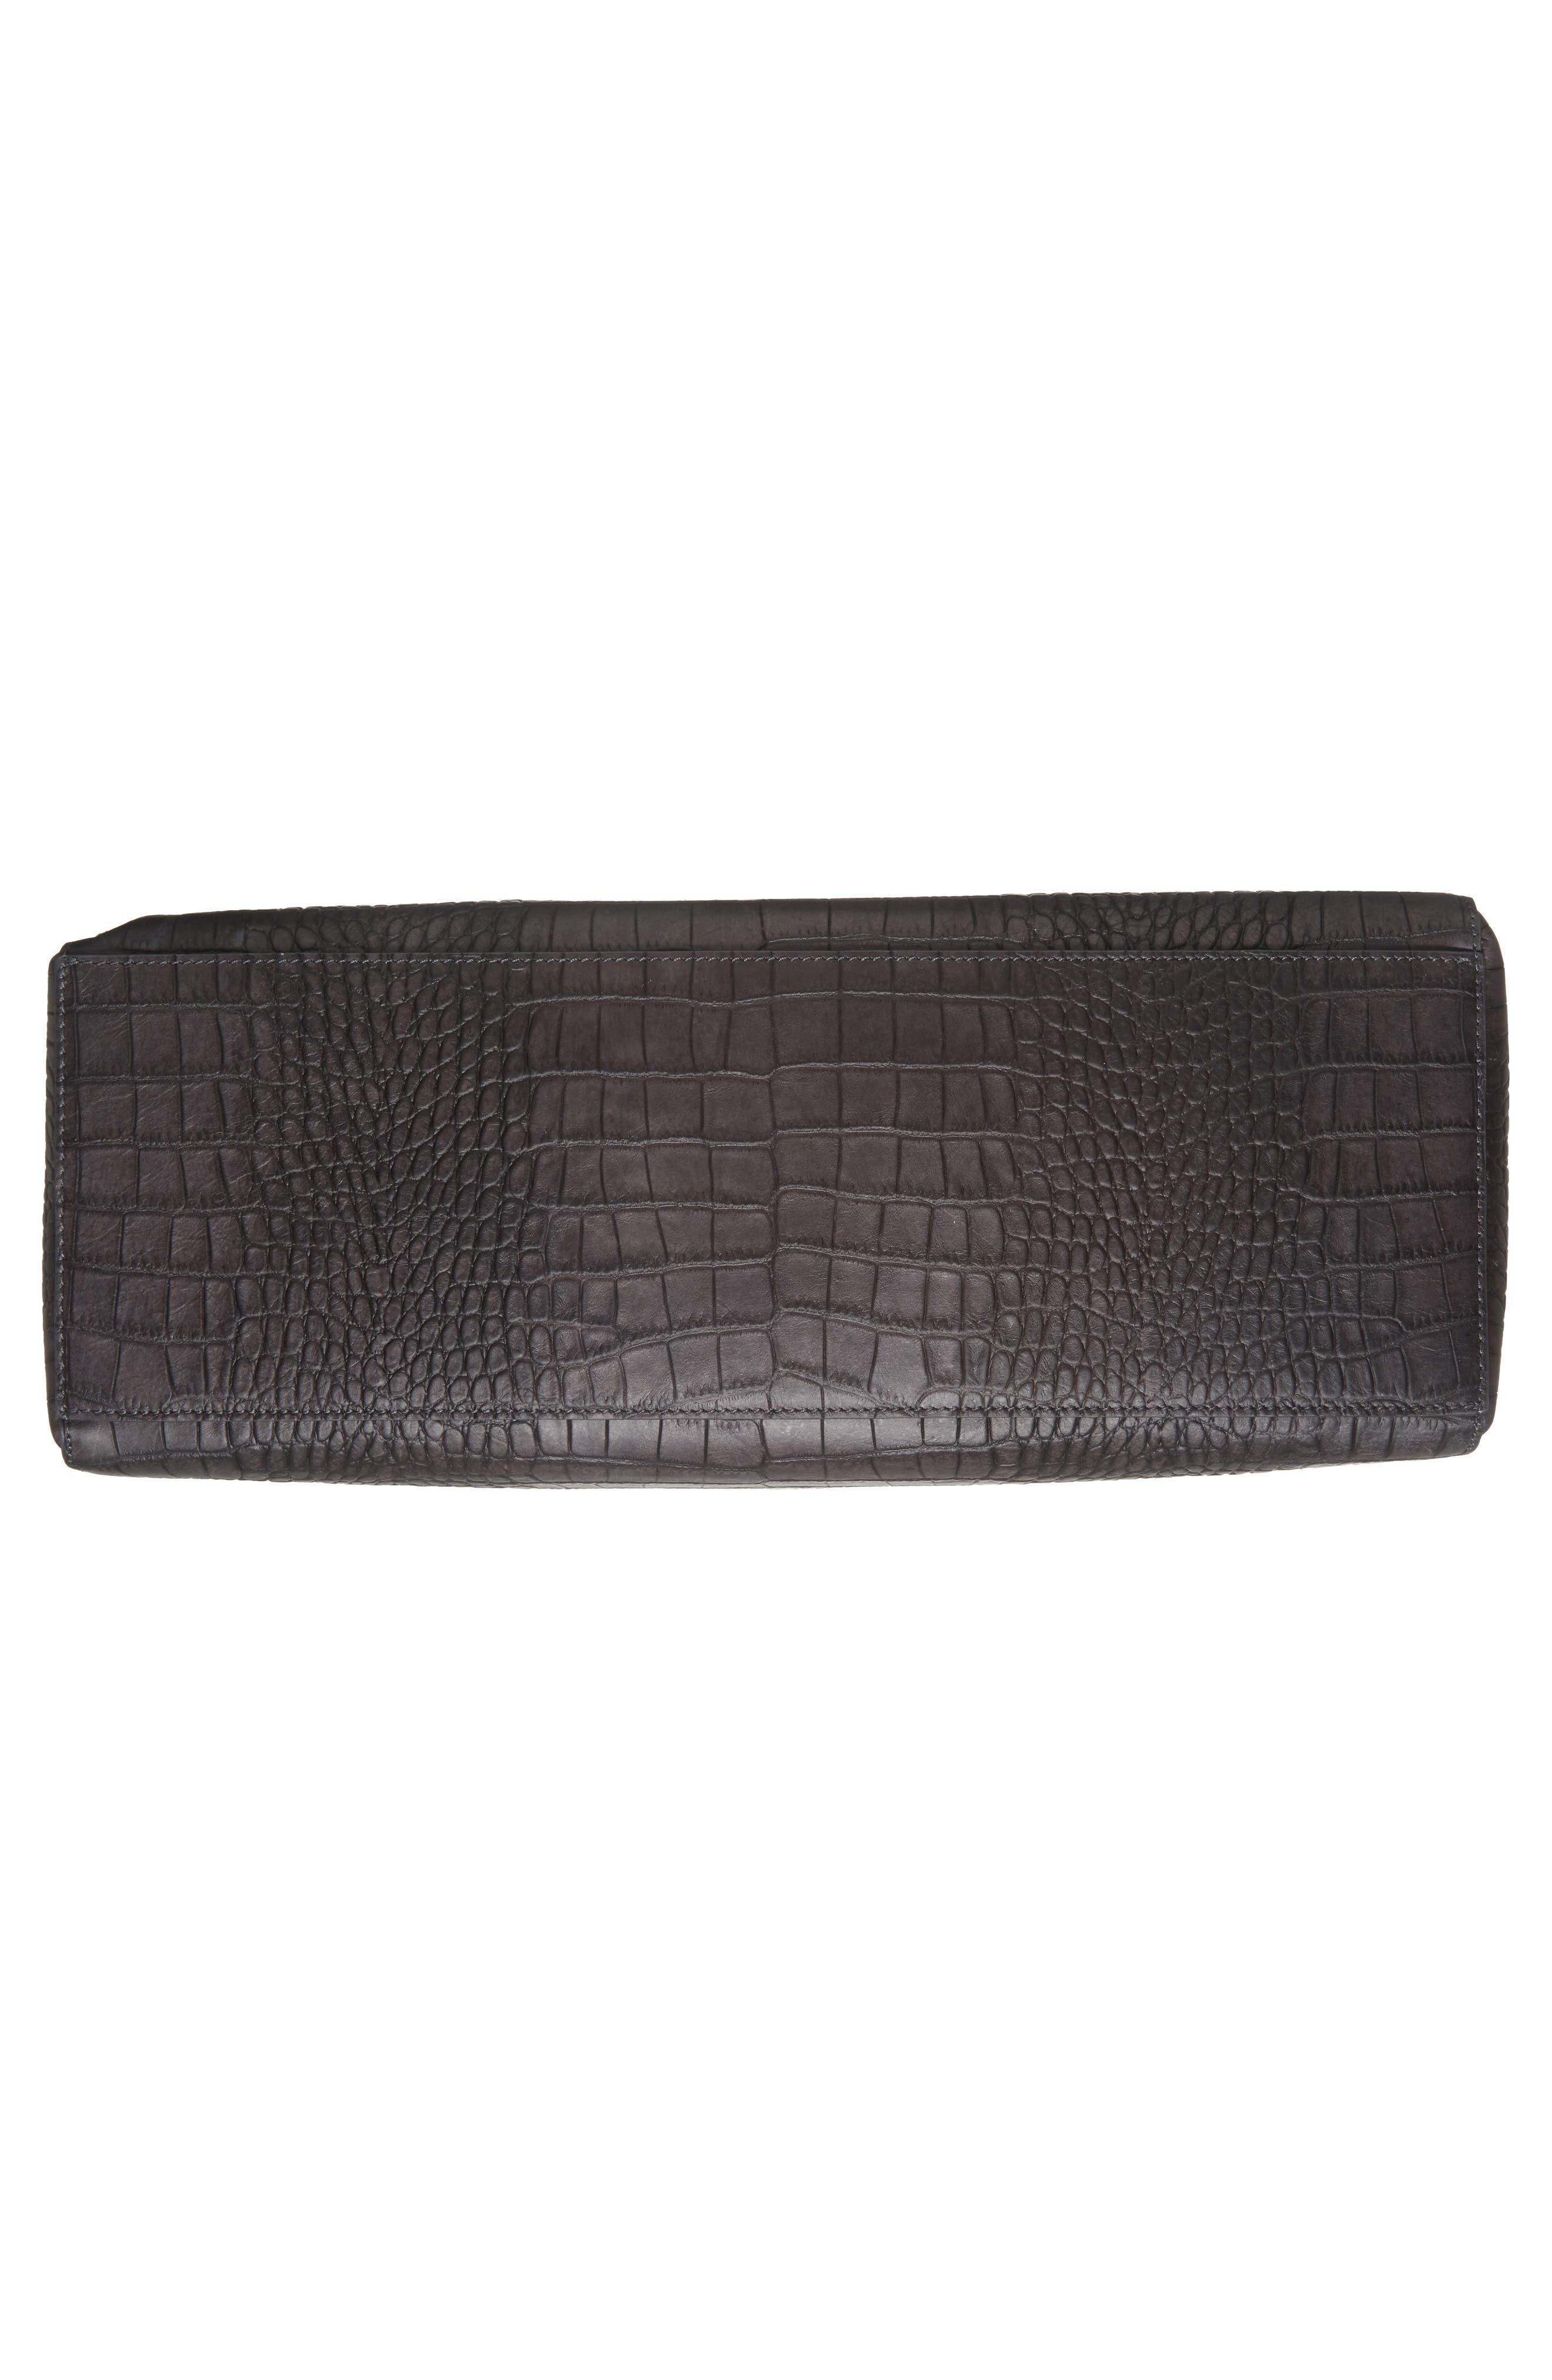 Large Sveva Croc Embossed Calfskin Leather Convertible Satchel,                             Alternate thumbnail 6, color,                             020